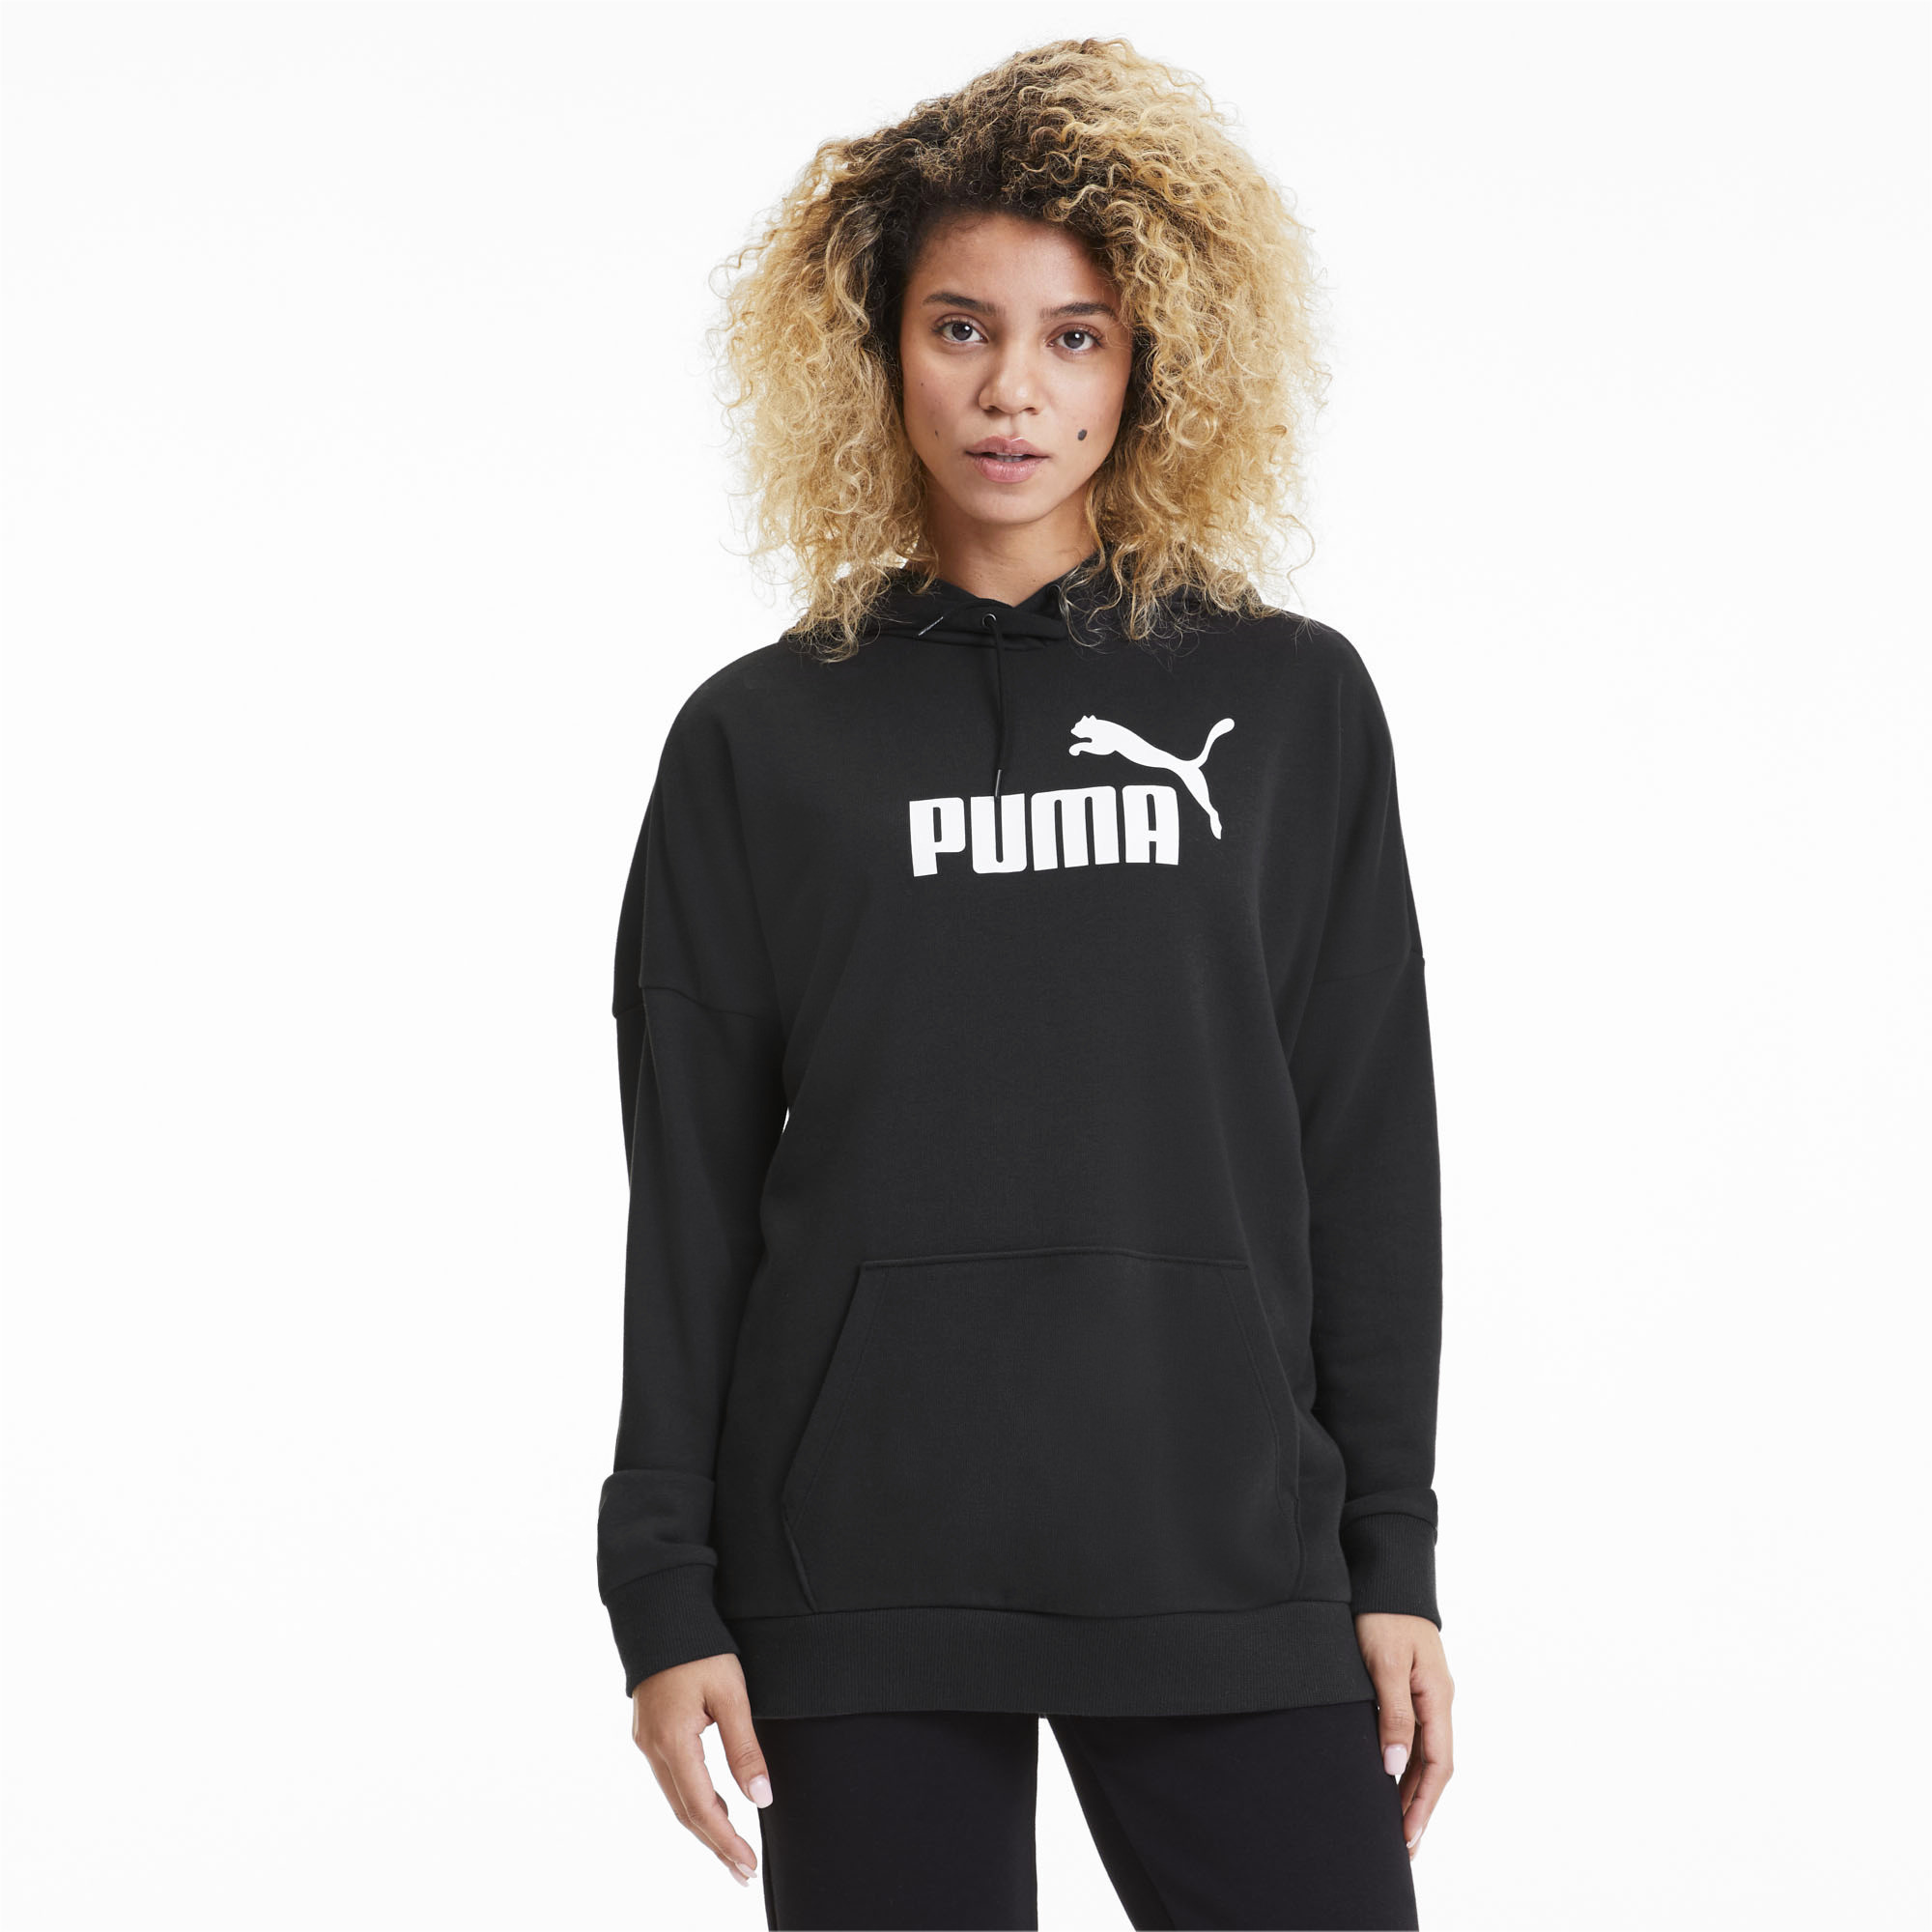 PUMA-Women-039-s-Essentials-Elongated-Hoodie thumbnail 4